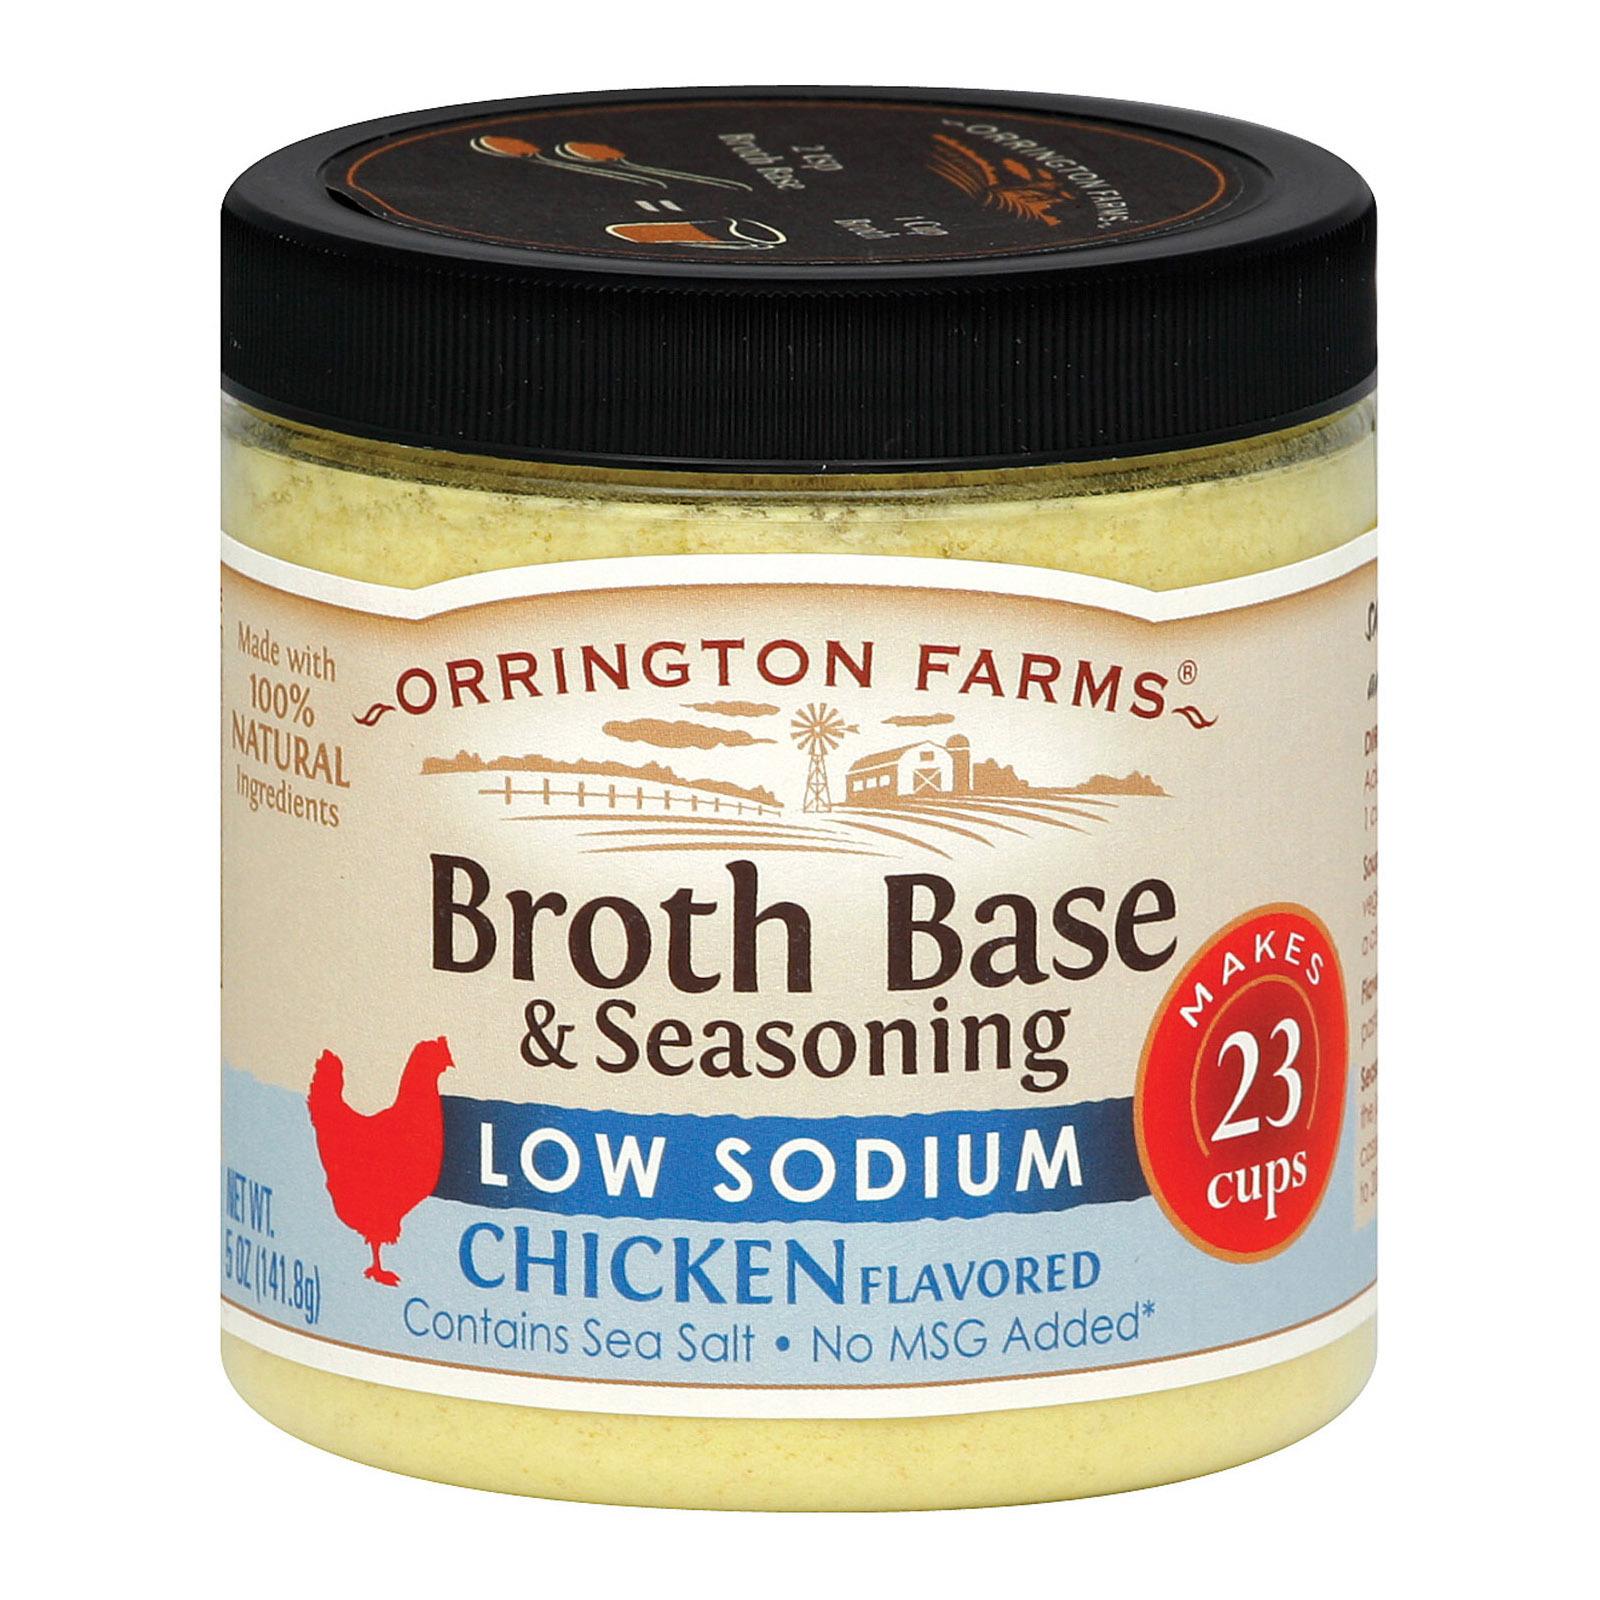 Orrington Farms Low Sodium Broth Base and Seasoning - Chicken - Case of 6 - 5 oz.